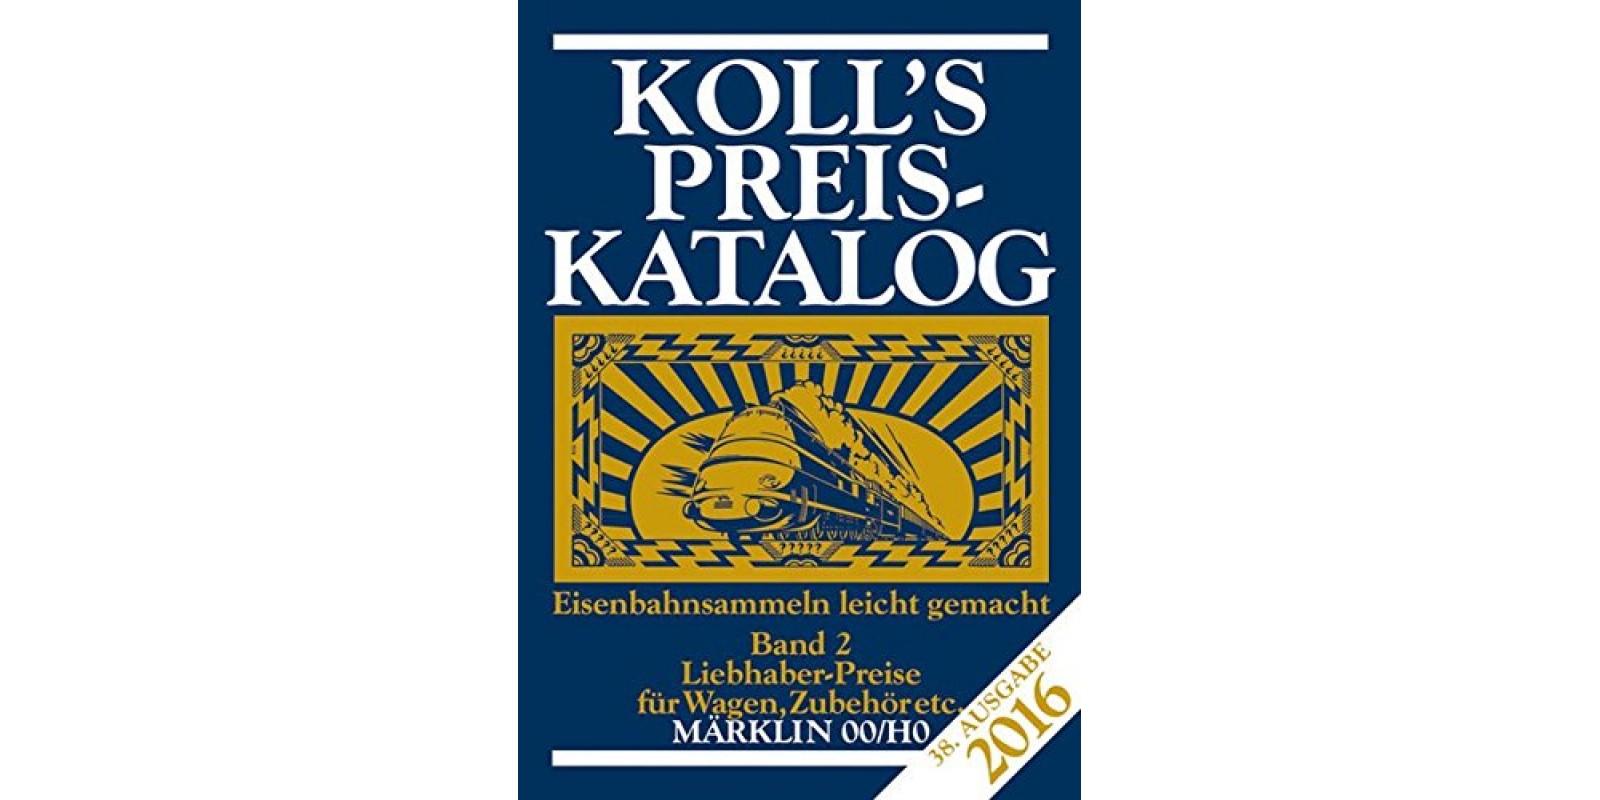 KOKA22016 Koll's Preiskatalog Band 1 ,2016